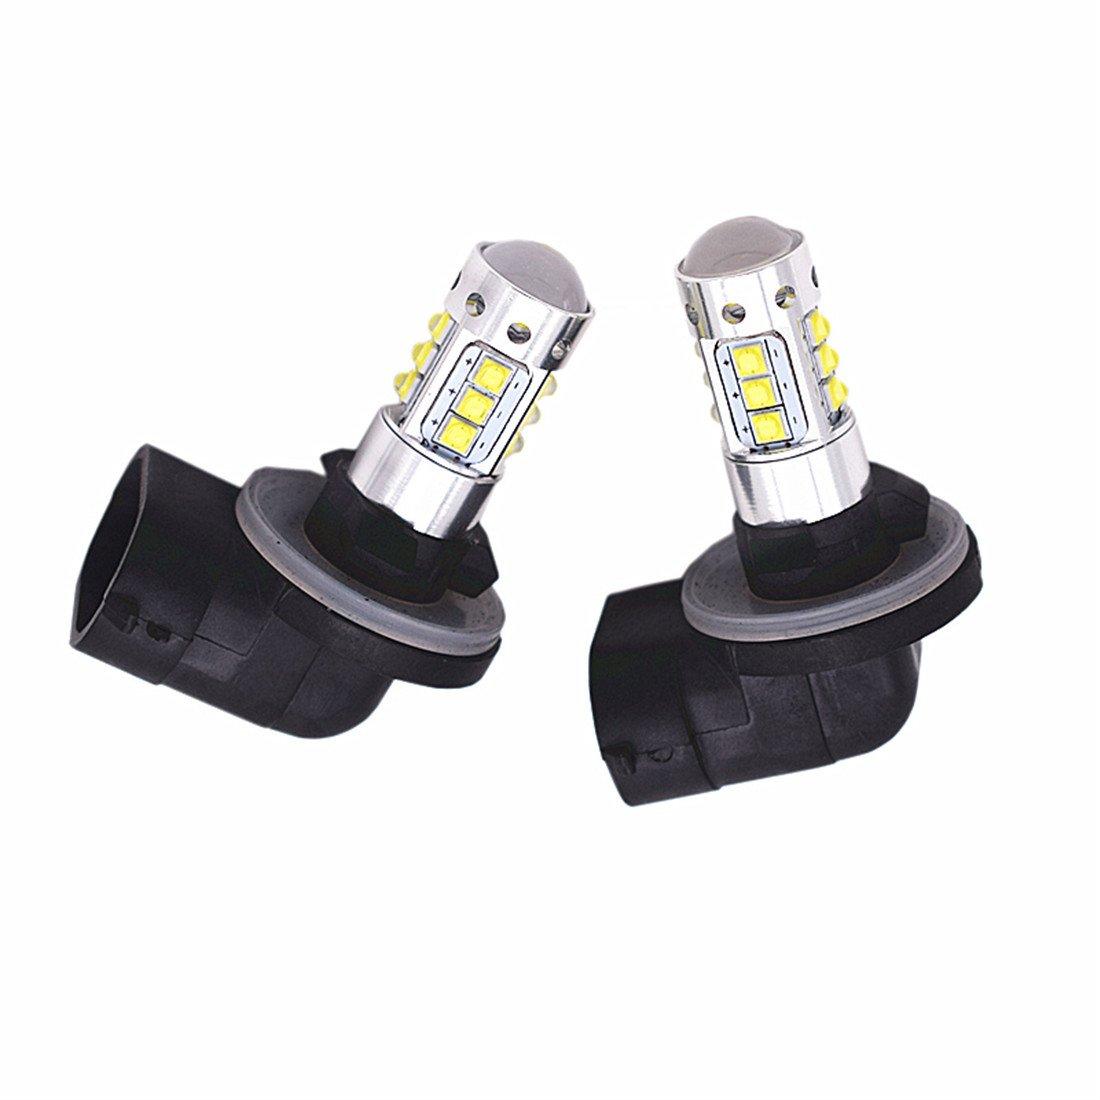 FEZZ 881 H27 Headlight LED Bulbs 80W XBD Head Lamps Driving Fog Lights Daytime Running DRL (Pack of 2) FZ0314